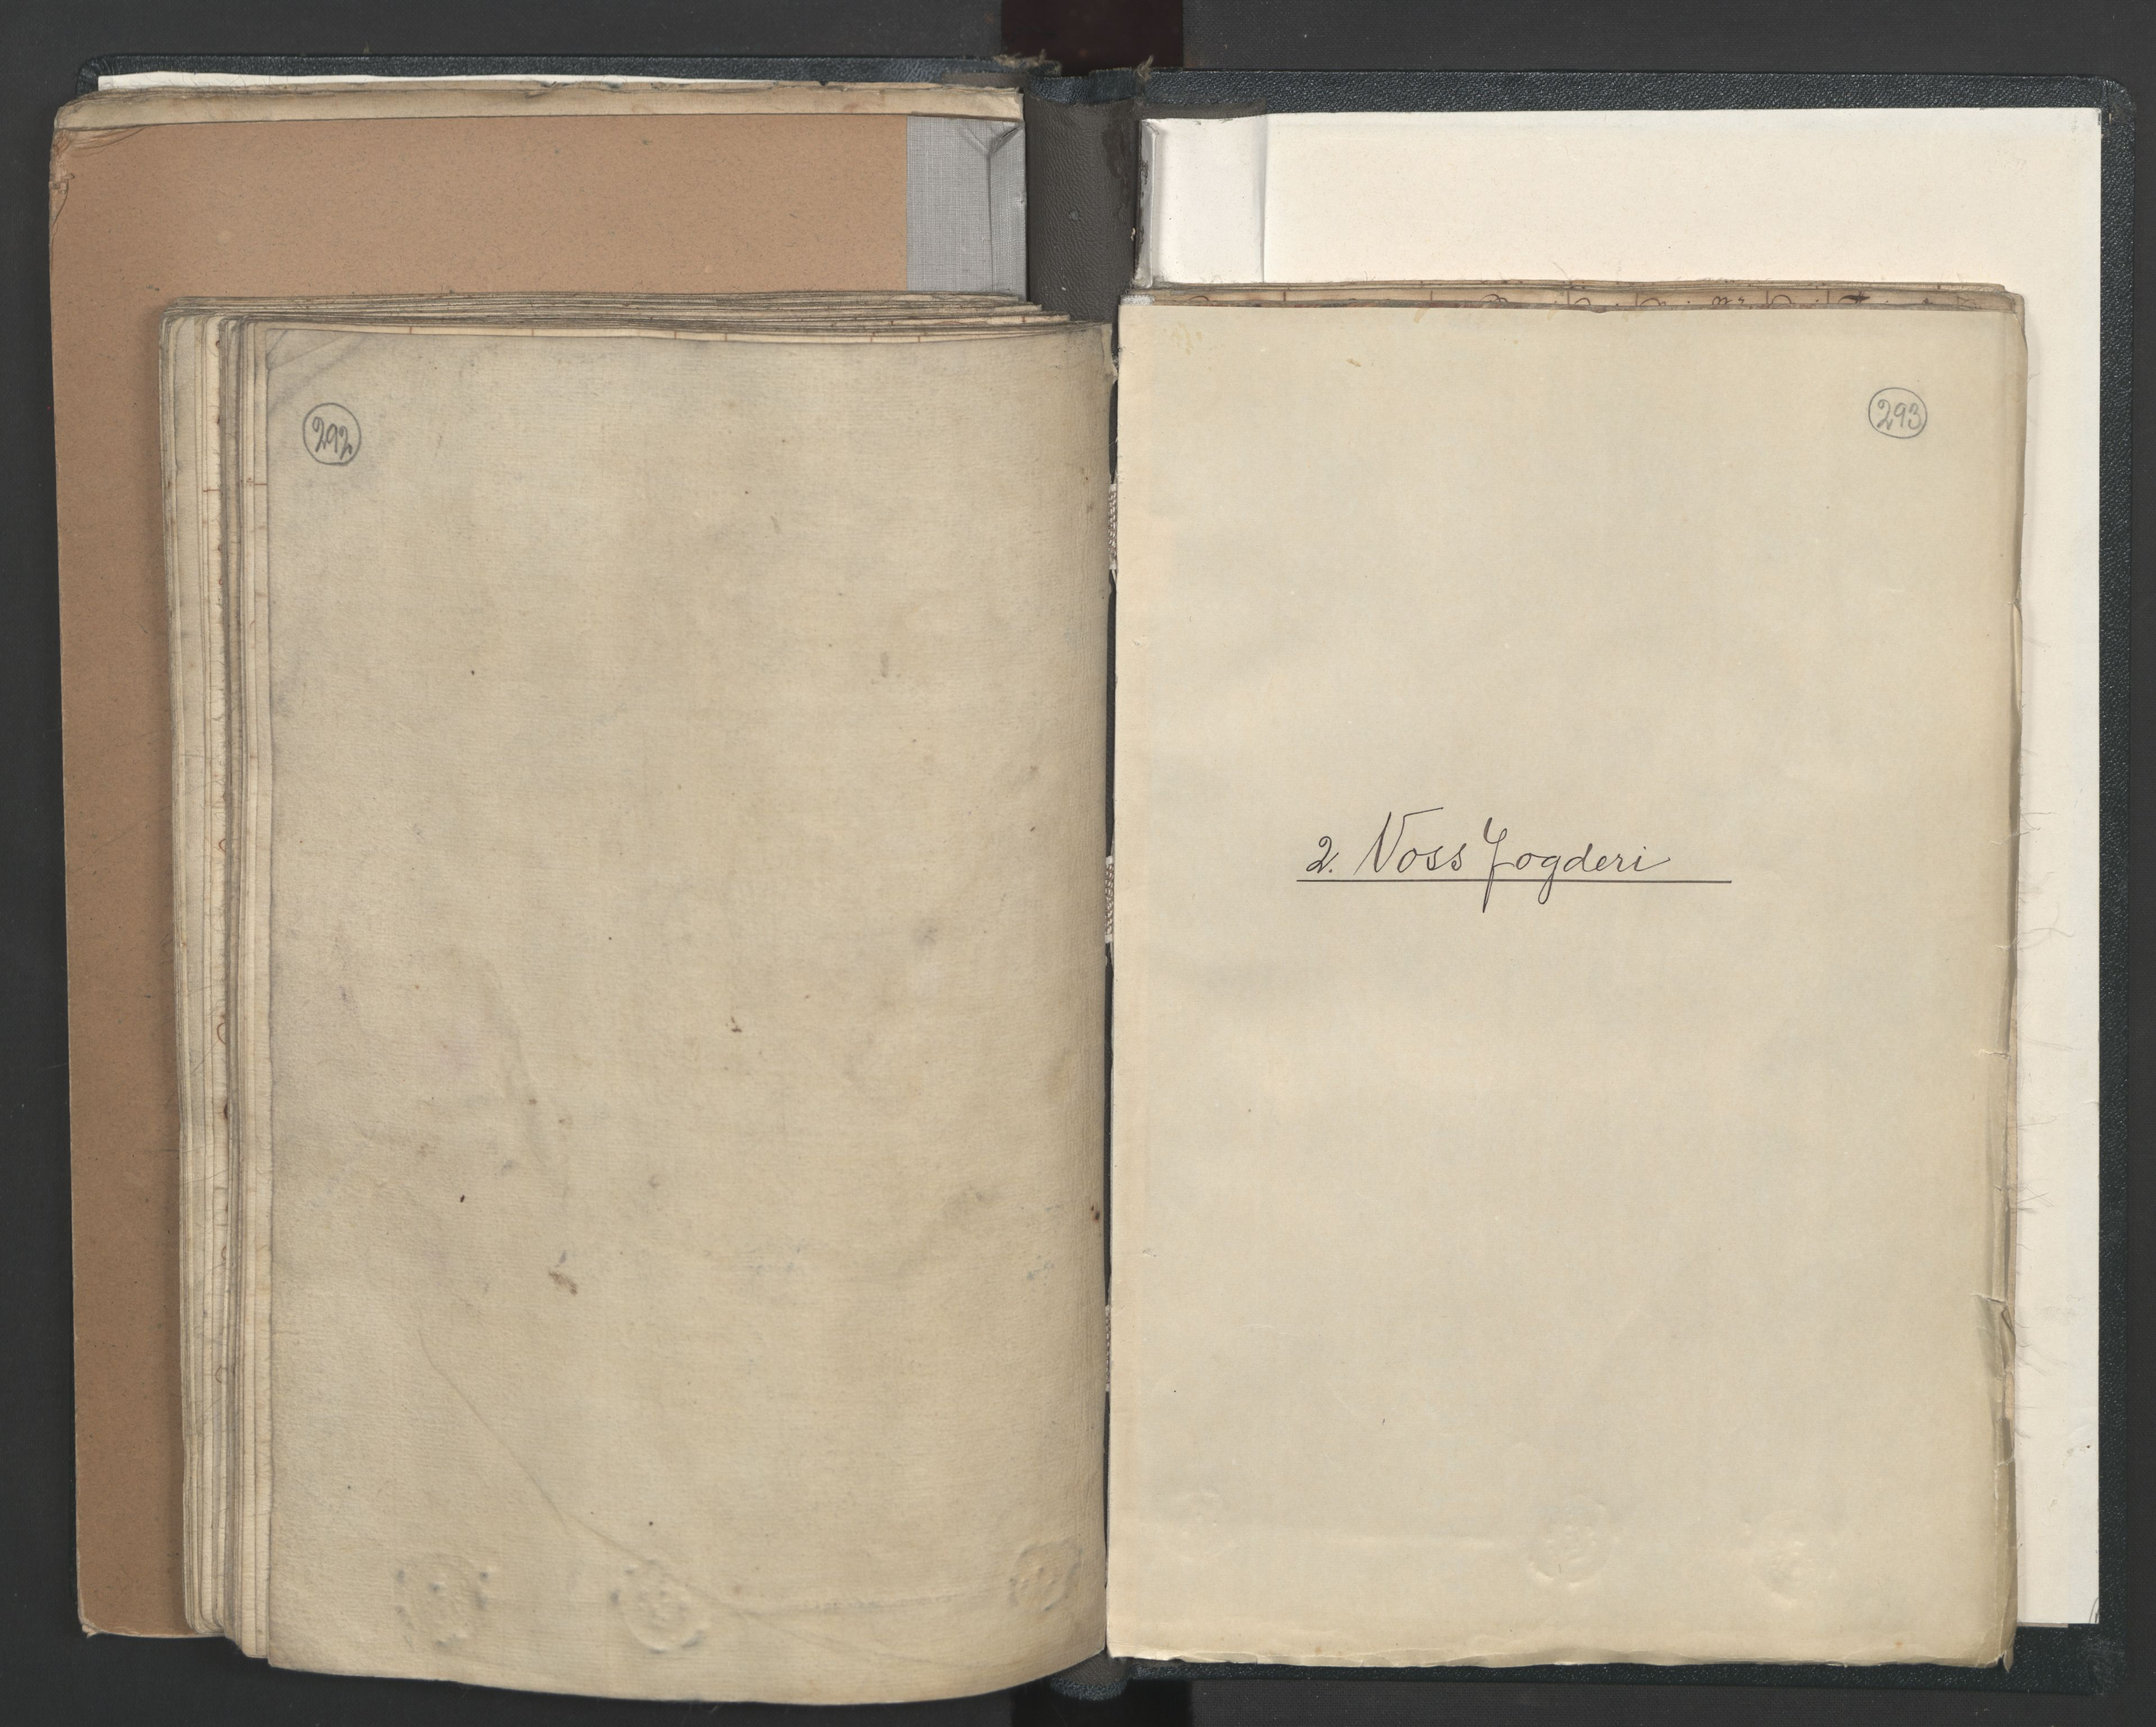 RA, Manntallet 1701, nr. 7: Nordhordland og Voss fogderi, 1701, s. 292-293